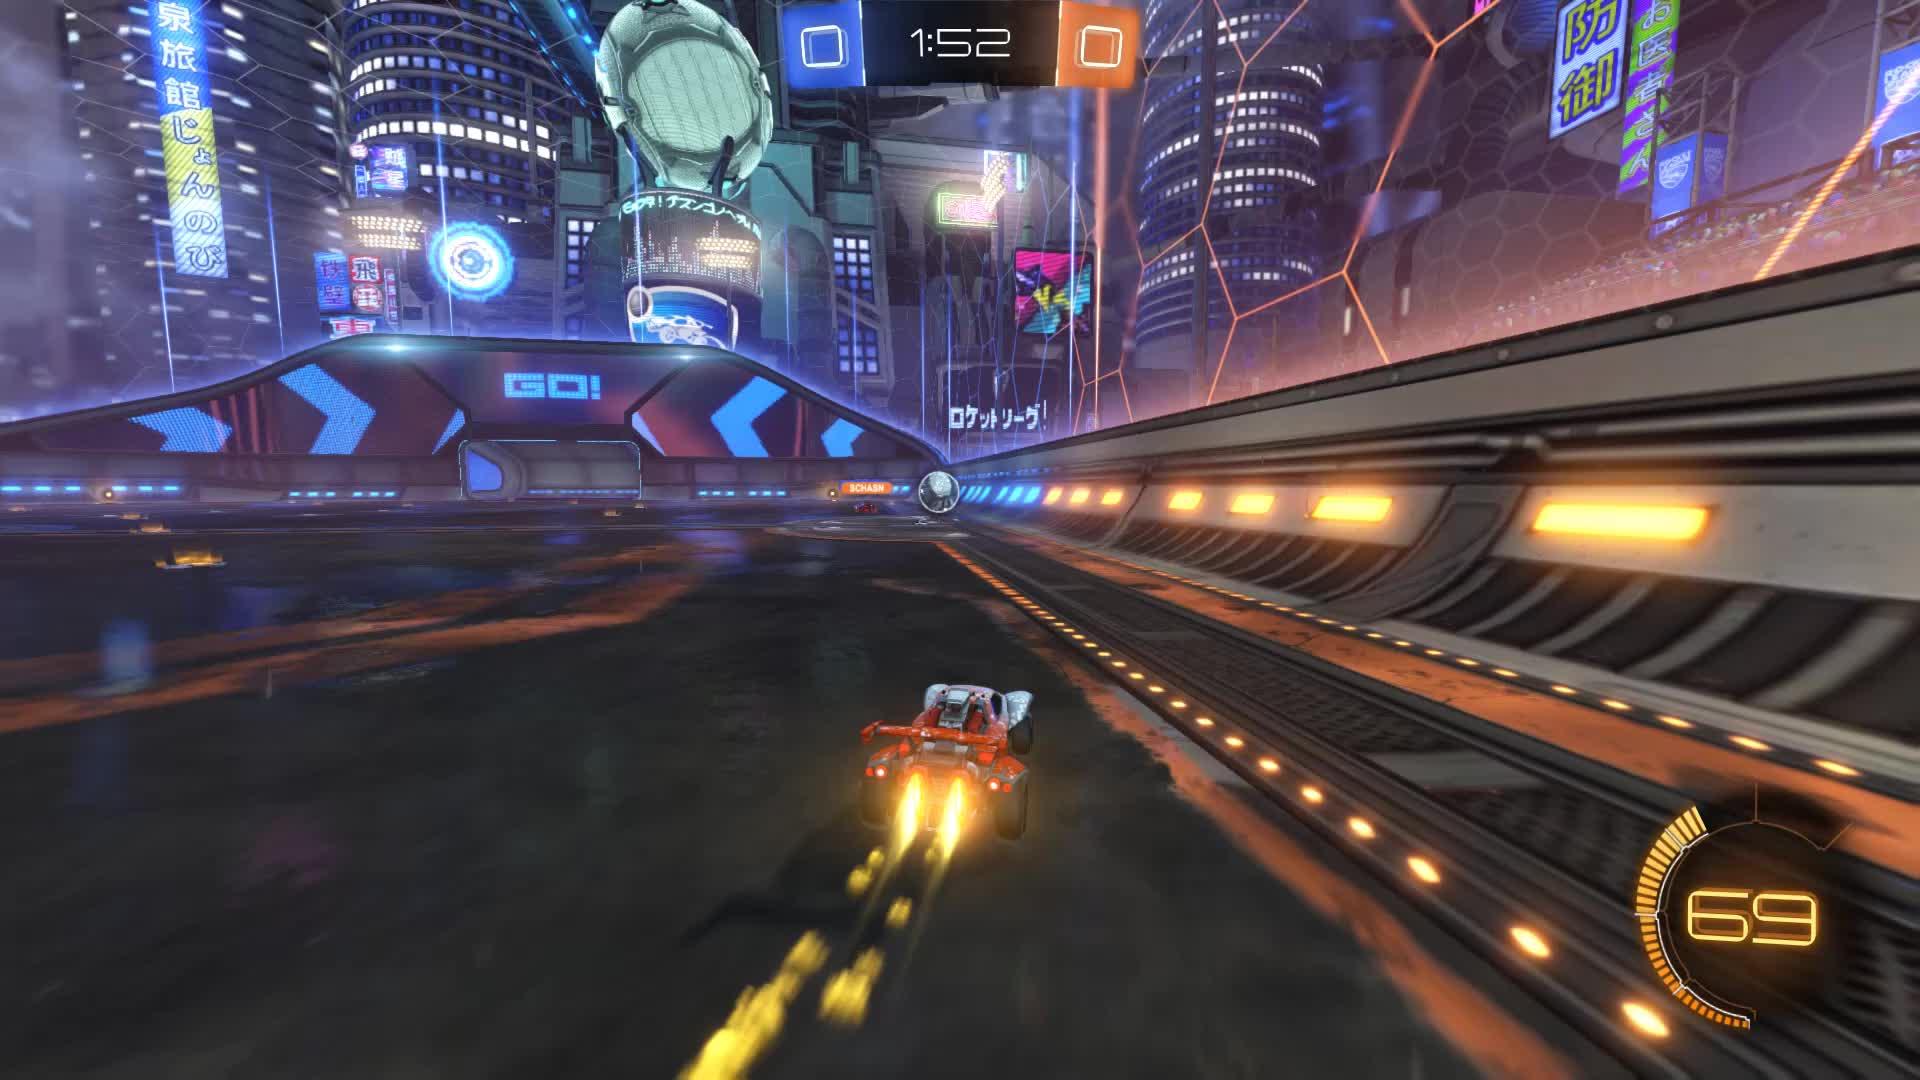 Gif Your Game, GifYourGame, Goal, Rocket League, RocketLeague, Squash, Goal 1: Squash GIFs